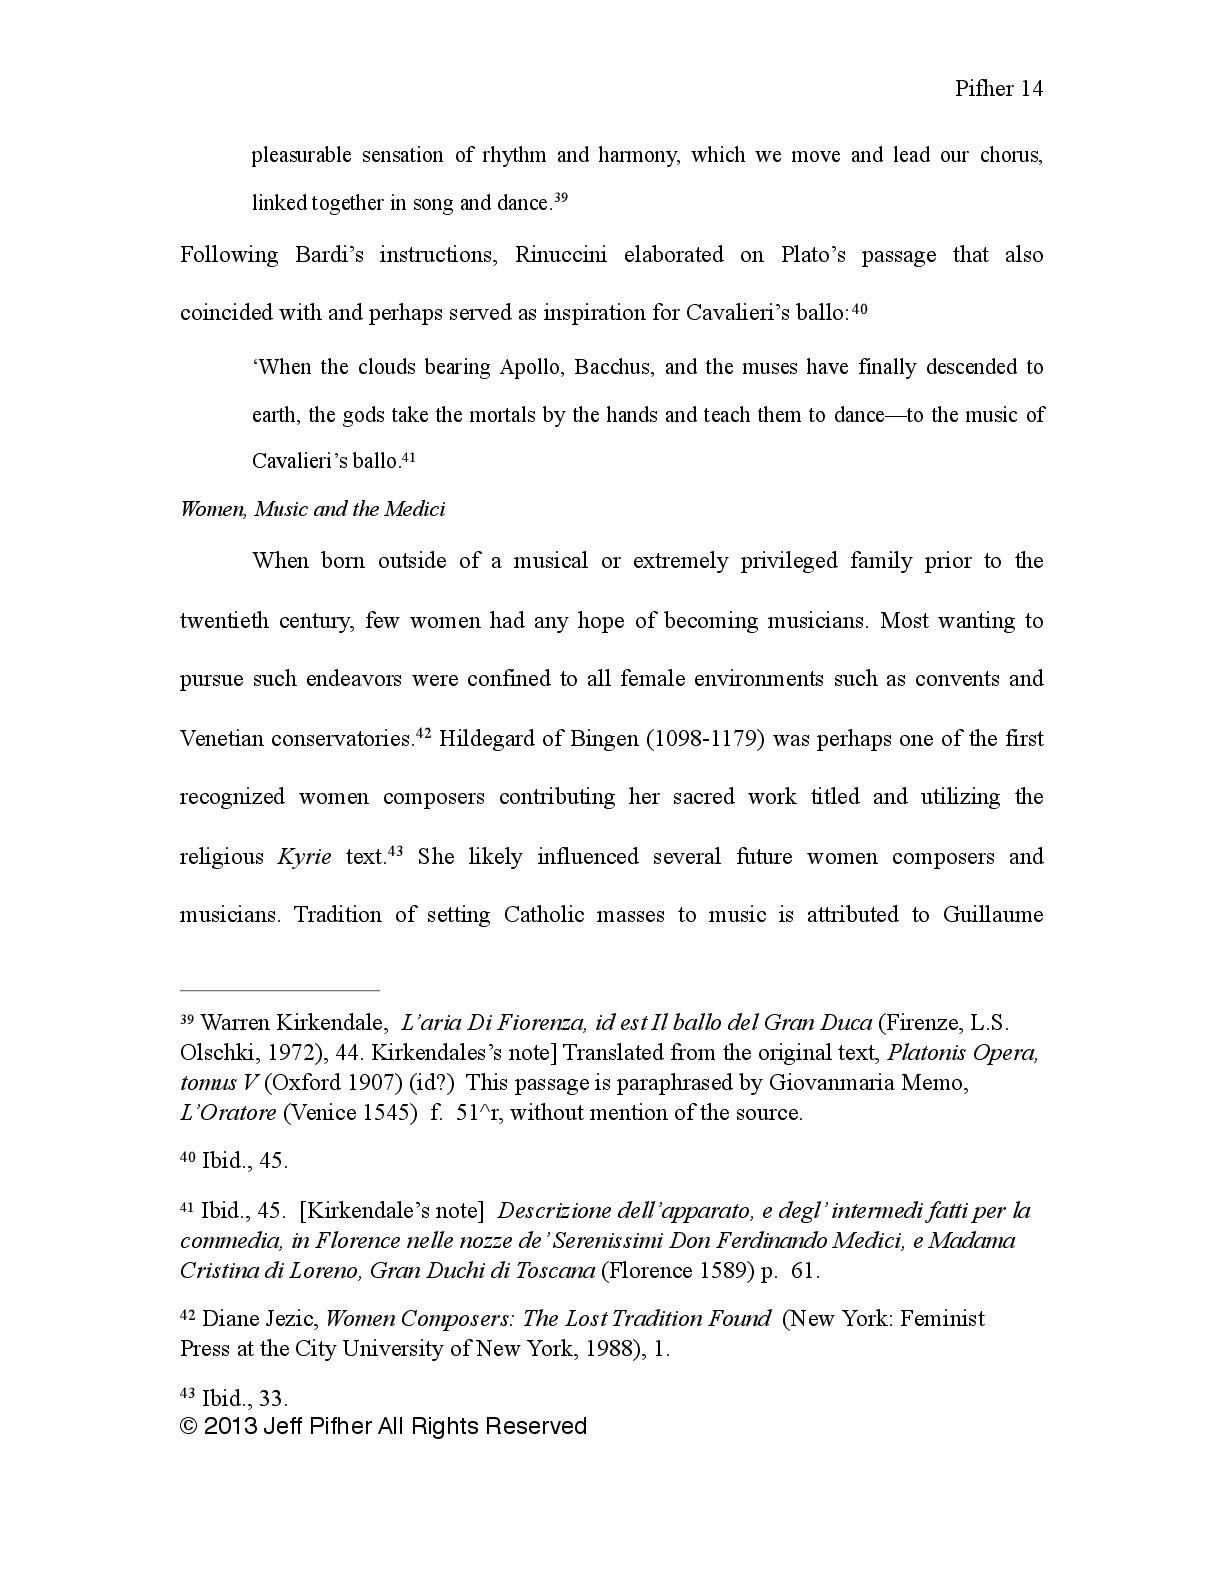 Jeff-Pifher-Music-and-Mediciean-Influences-(Academic-Series)-014.jpg